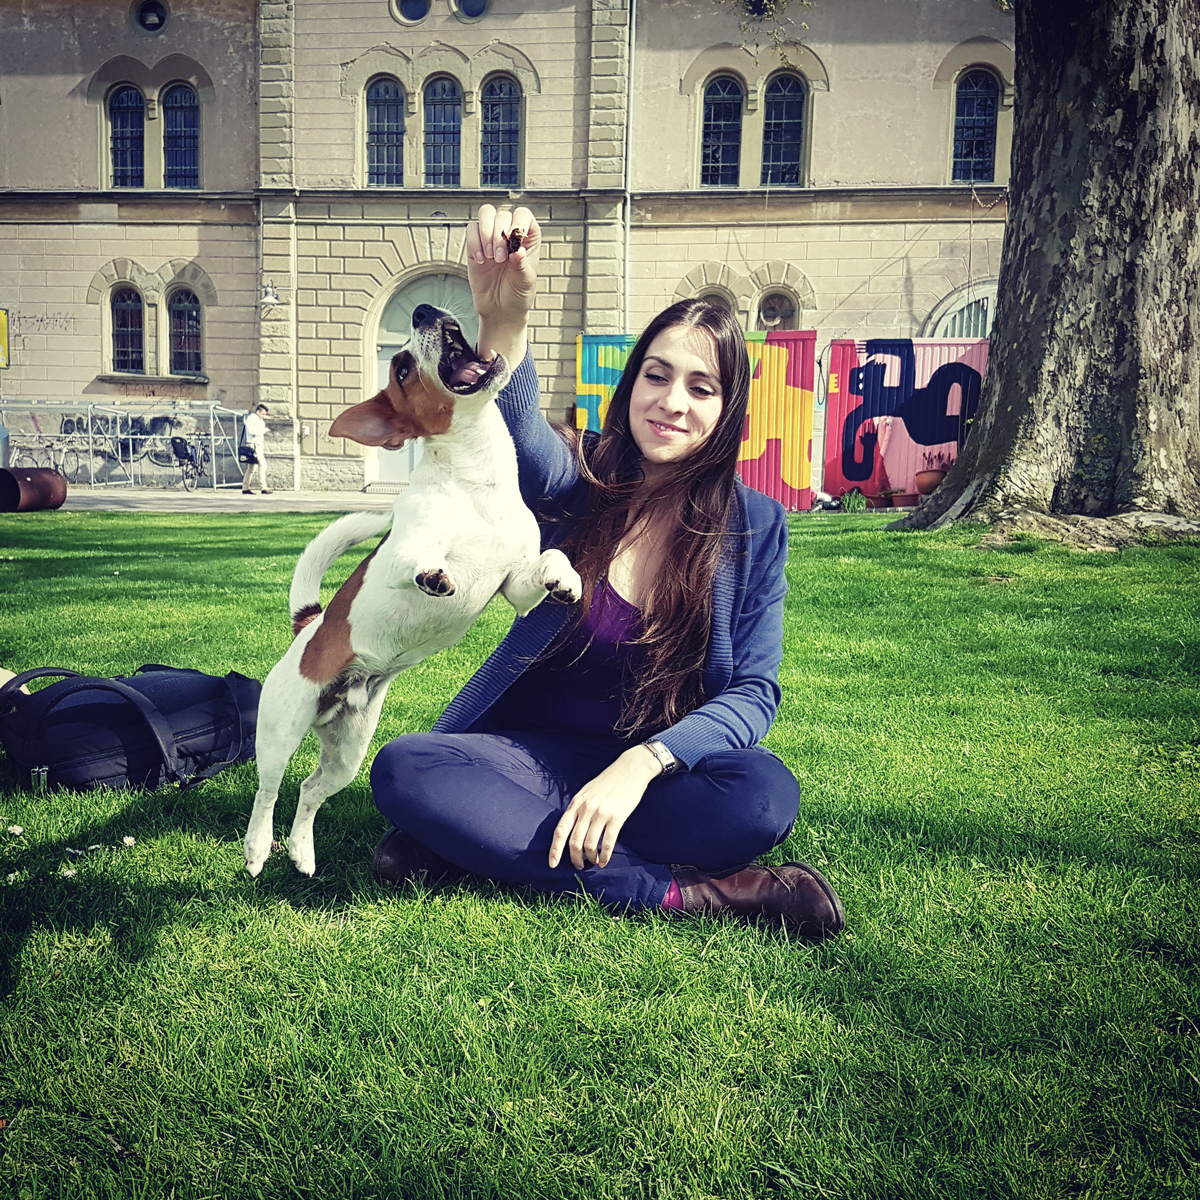 Dogs in Switzerland